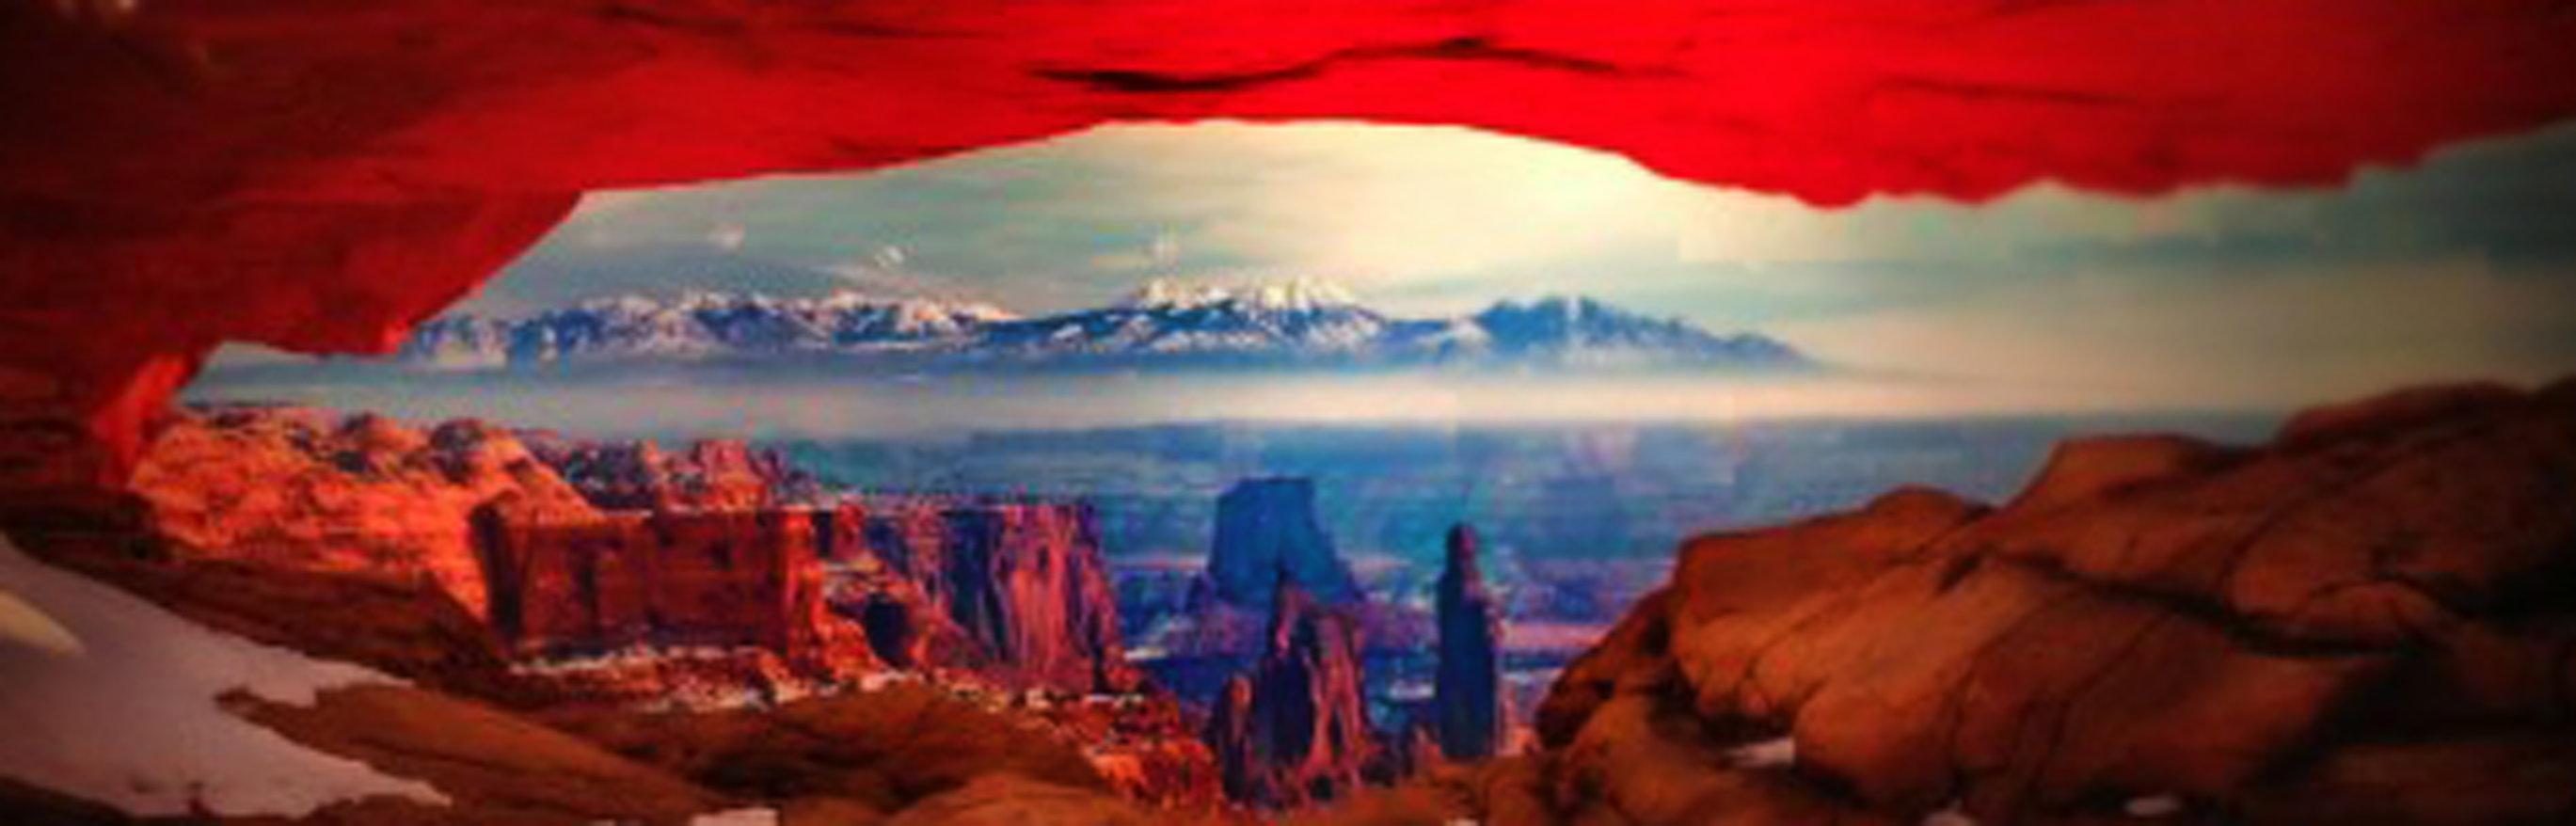 Timeless Land (Canyonlands NP, Utah) 1.5M Huge Panorama by Peter Lik